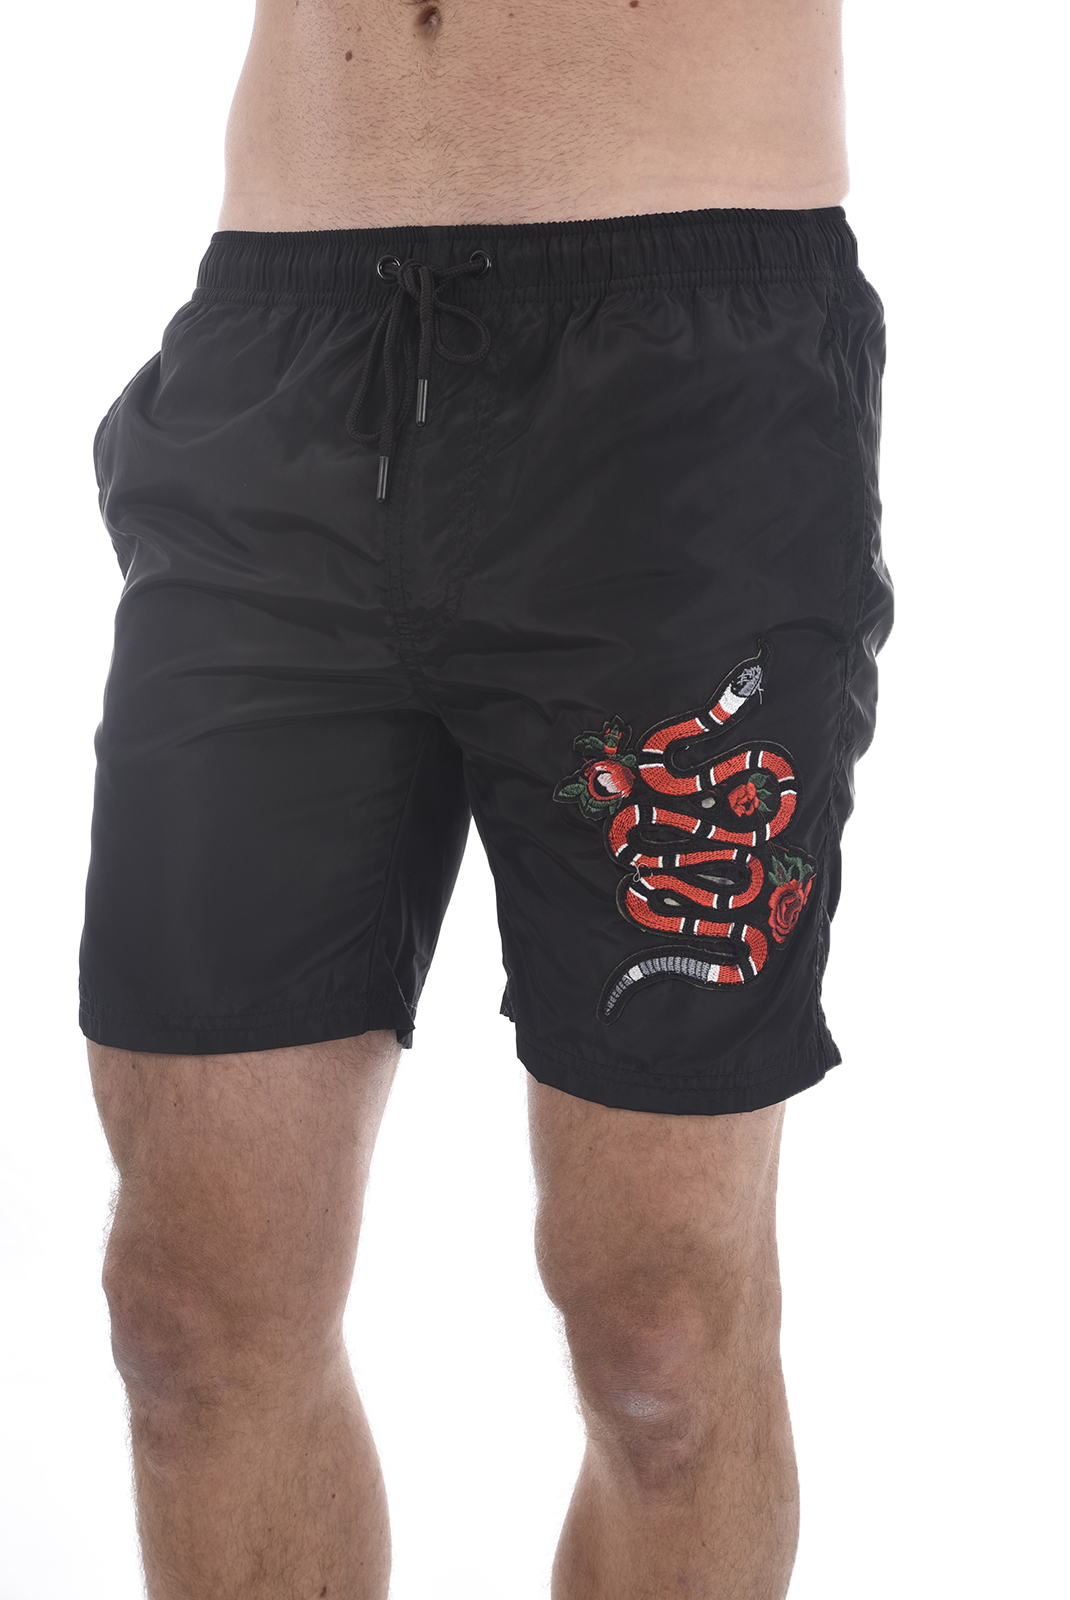 Shorts de bain  Hite couture ZOLIER NOIR